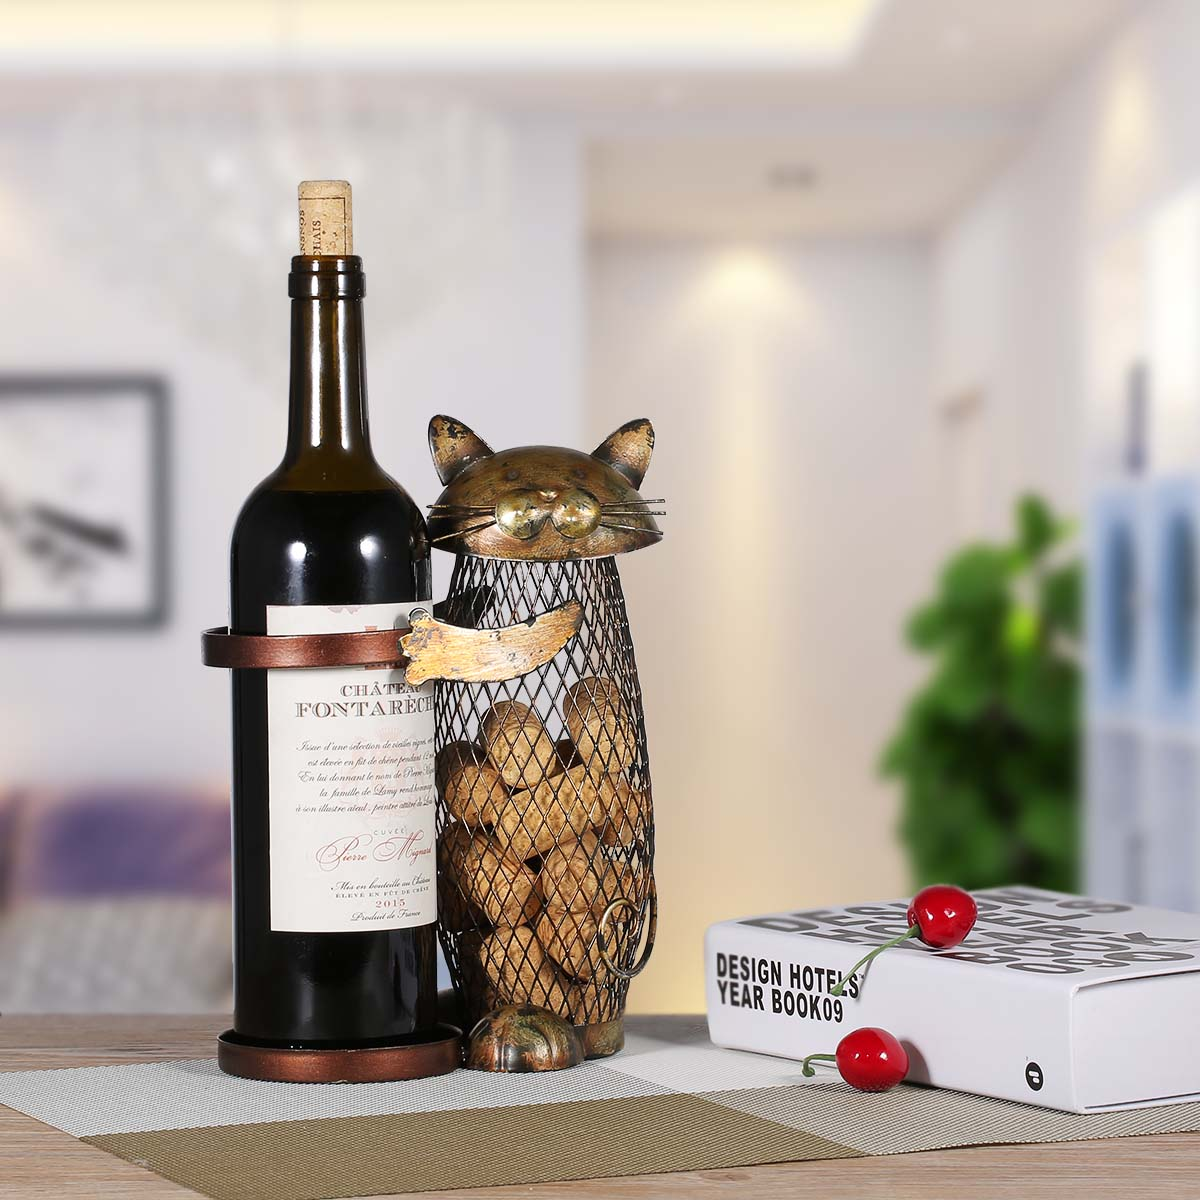 Tooarts Cat Wine Rack Cork Container Bottle Wine Holder Kitchen Bar Metal Wine Craft Christmas Gift Handcraft Animal Wine Stand 19